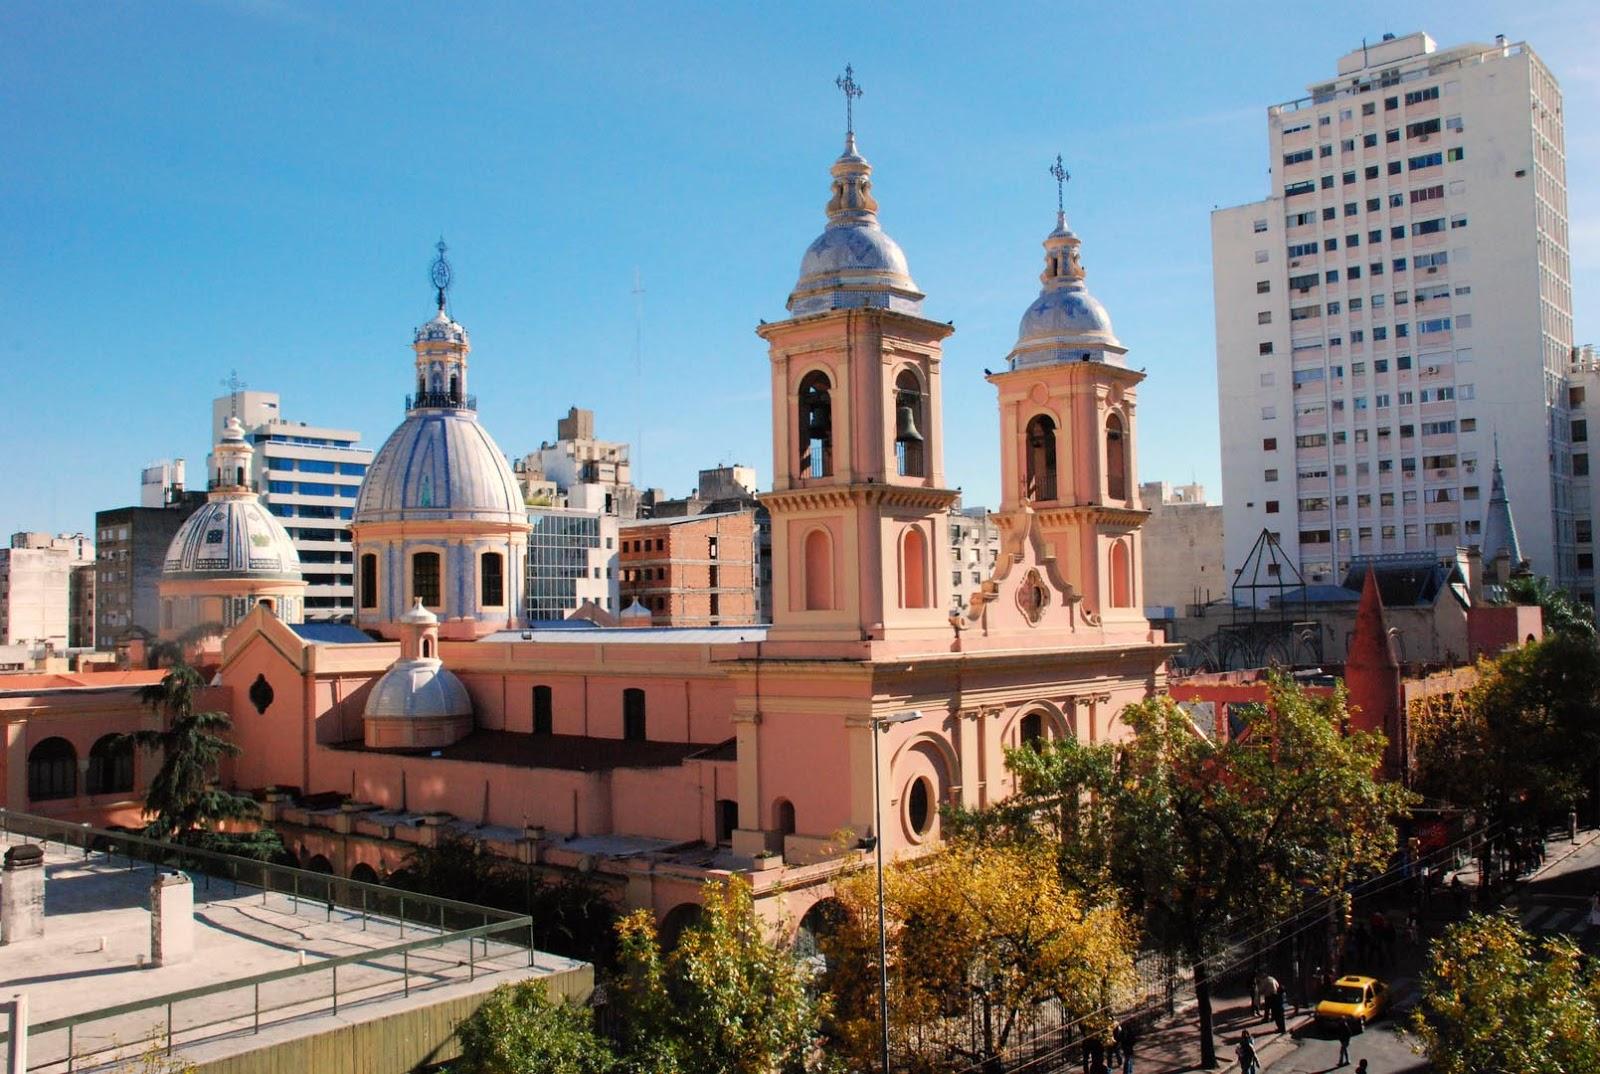 http://intranetpzl.com.br/expo-mundi/wp-content/uploads/2015/11/Córdoba_2.jpg